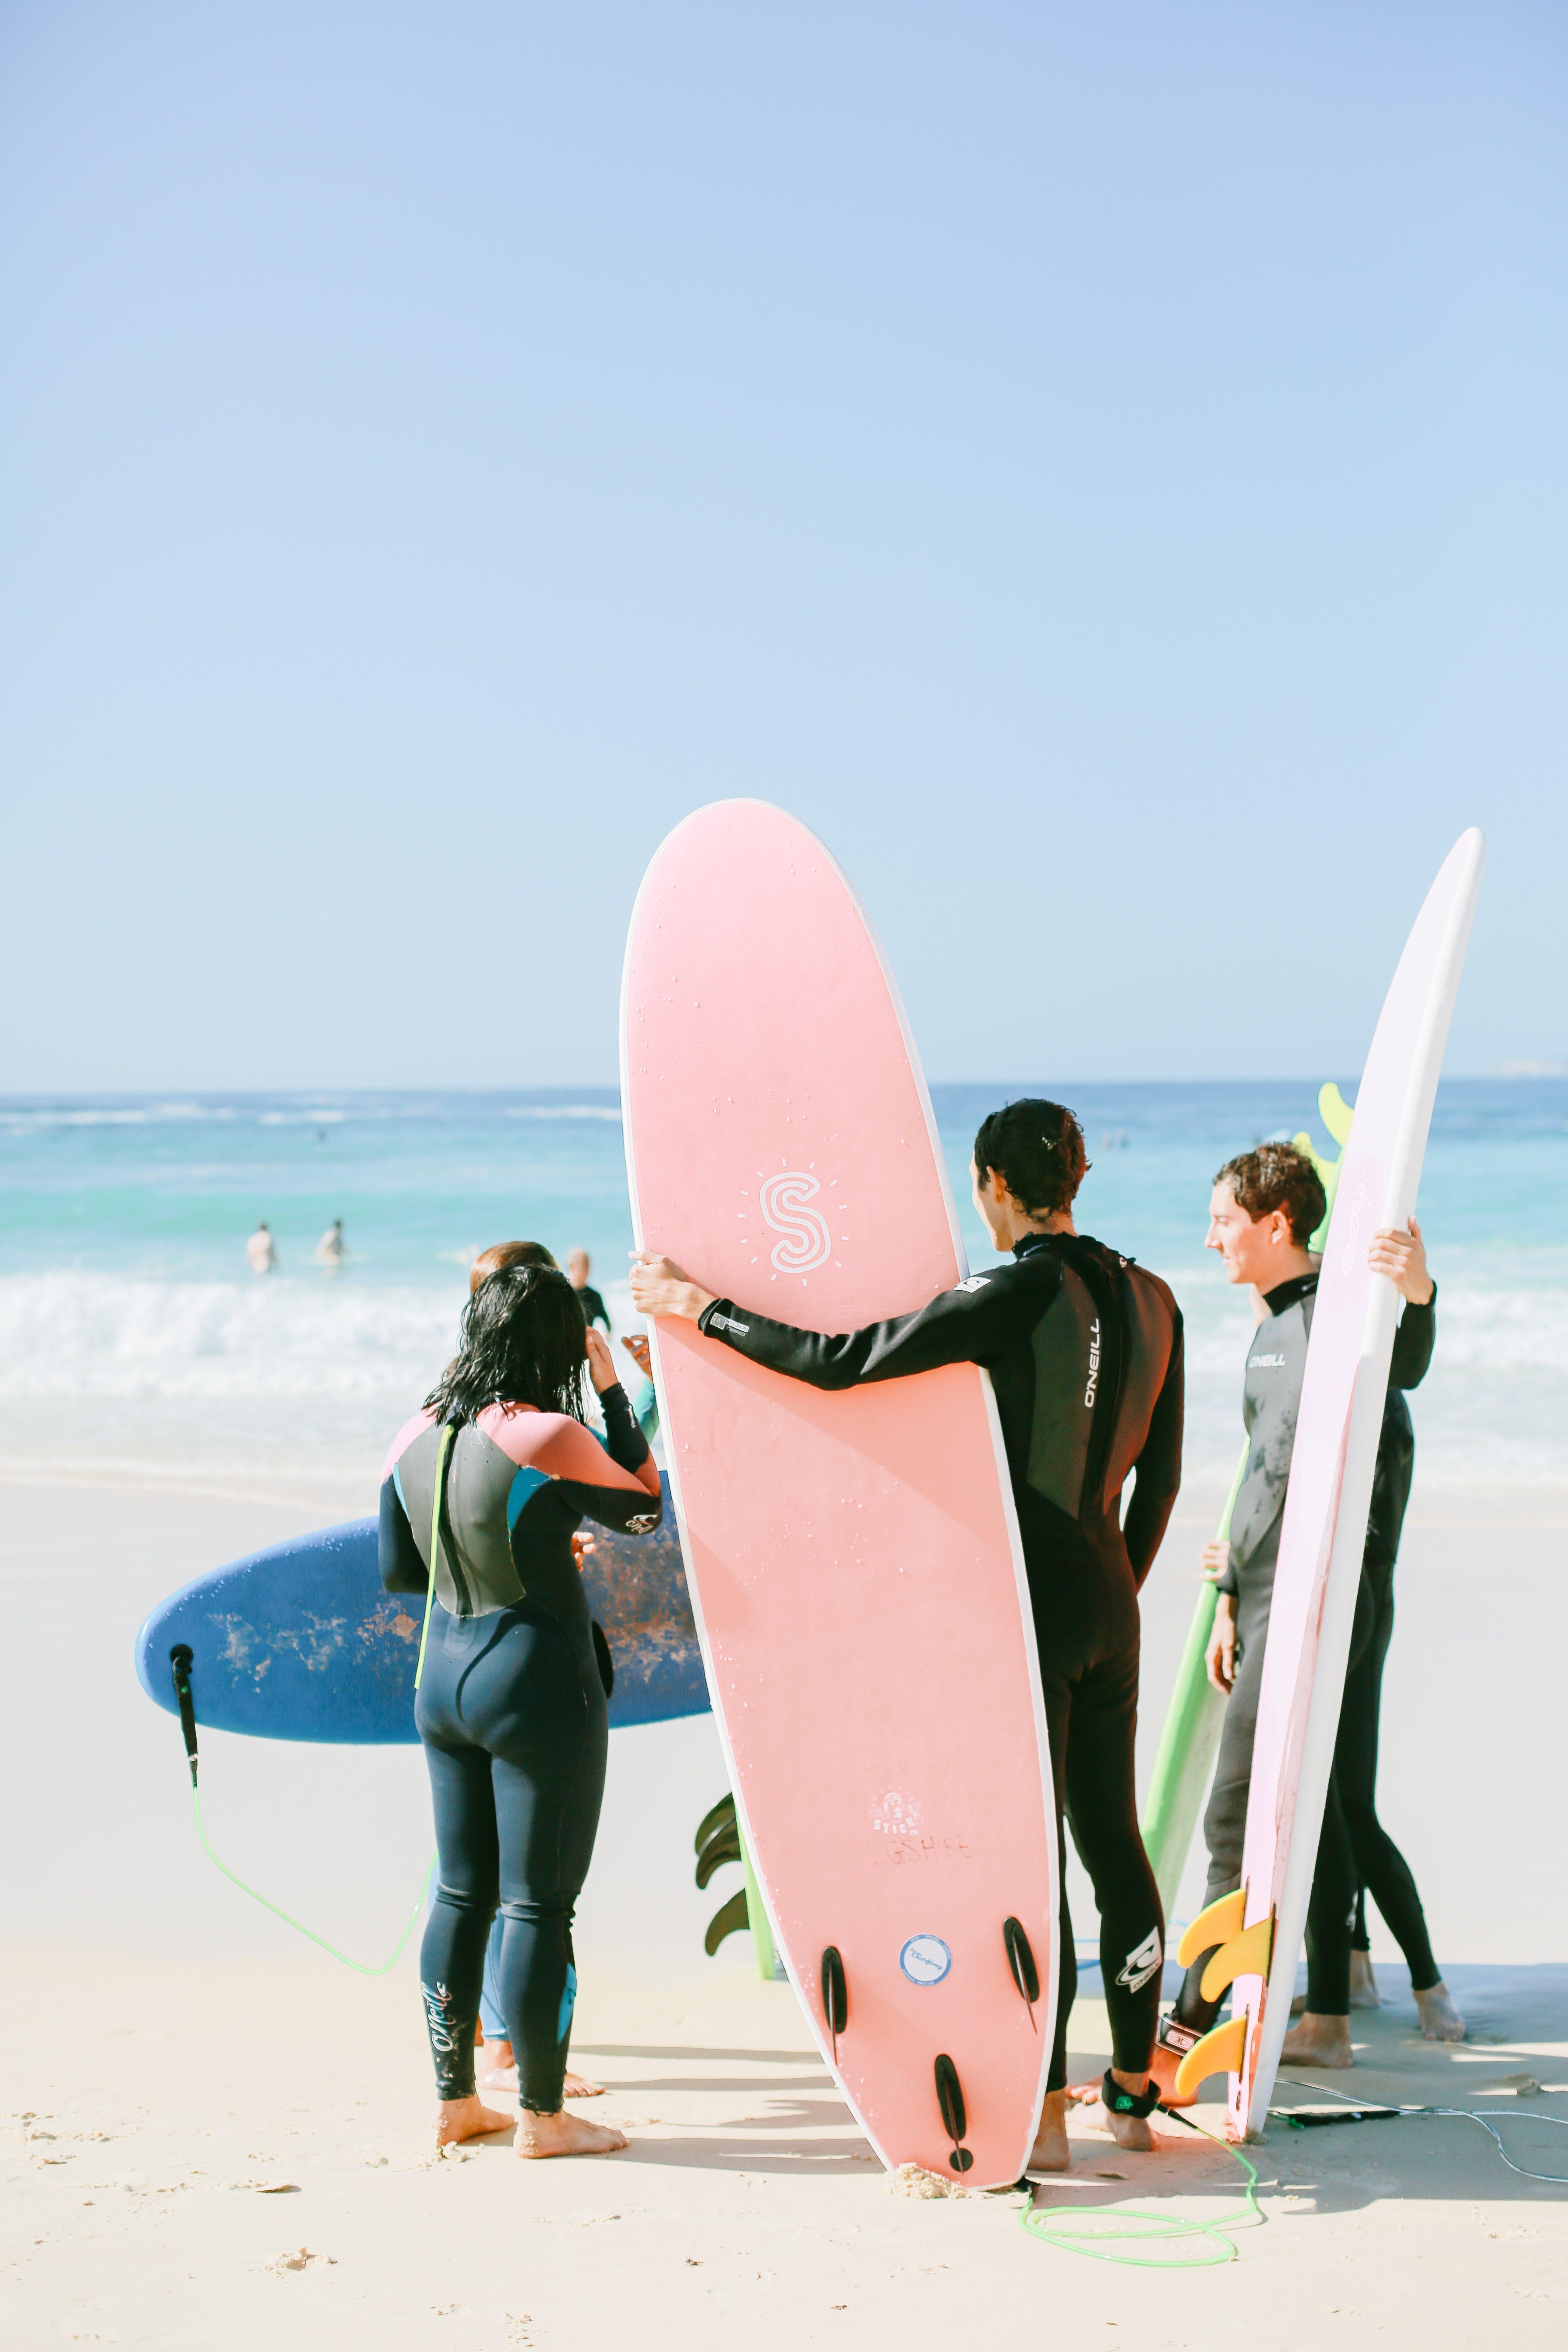 Photos gratuites de bord de l'océan, bord de mer, eau, été